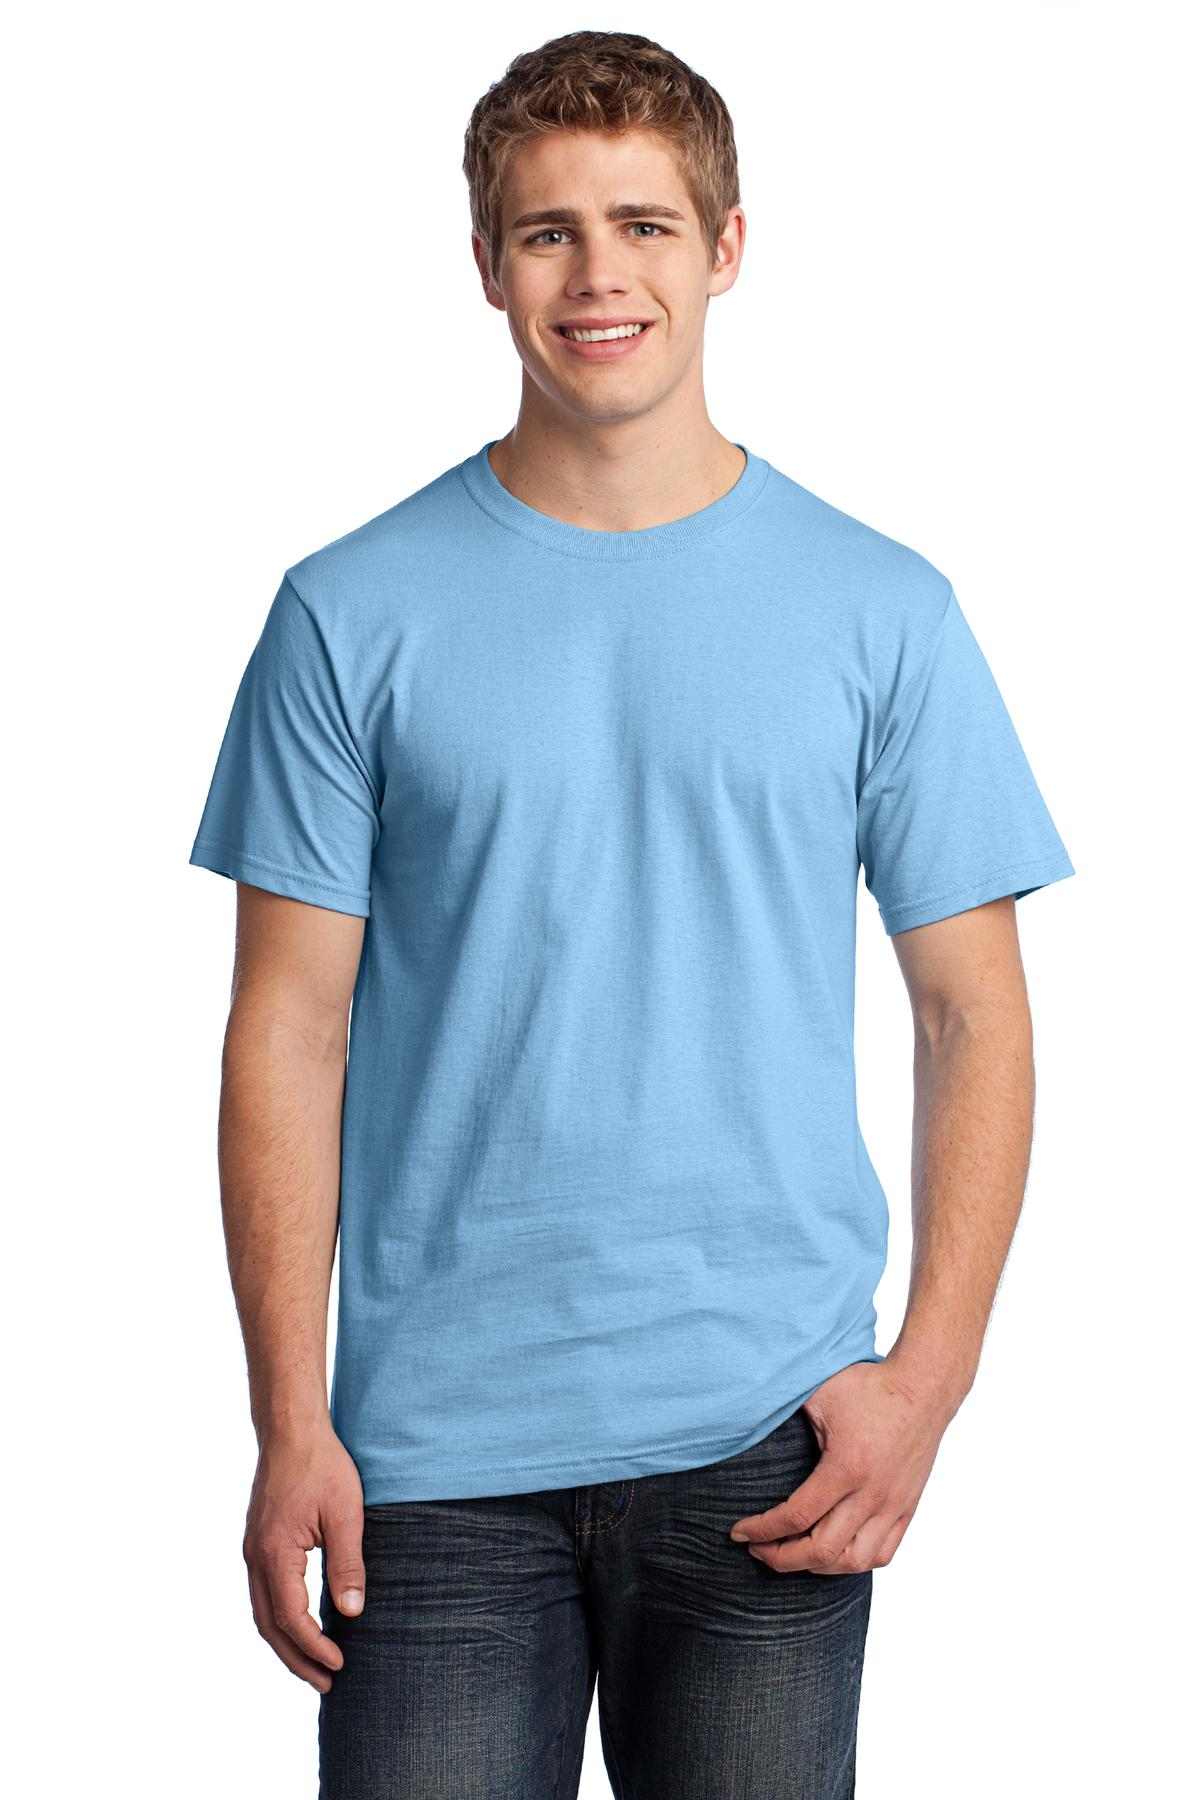 T-Shirts-100-Cotton-76